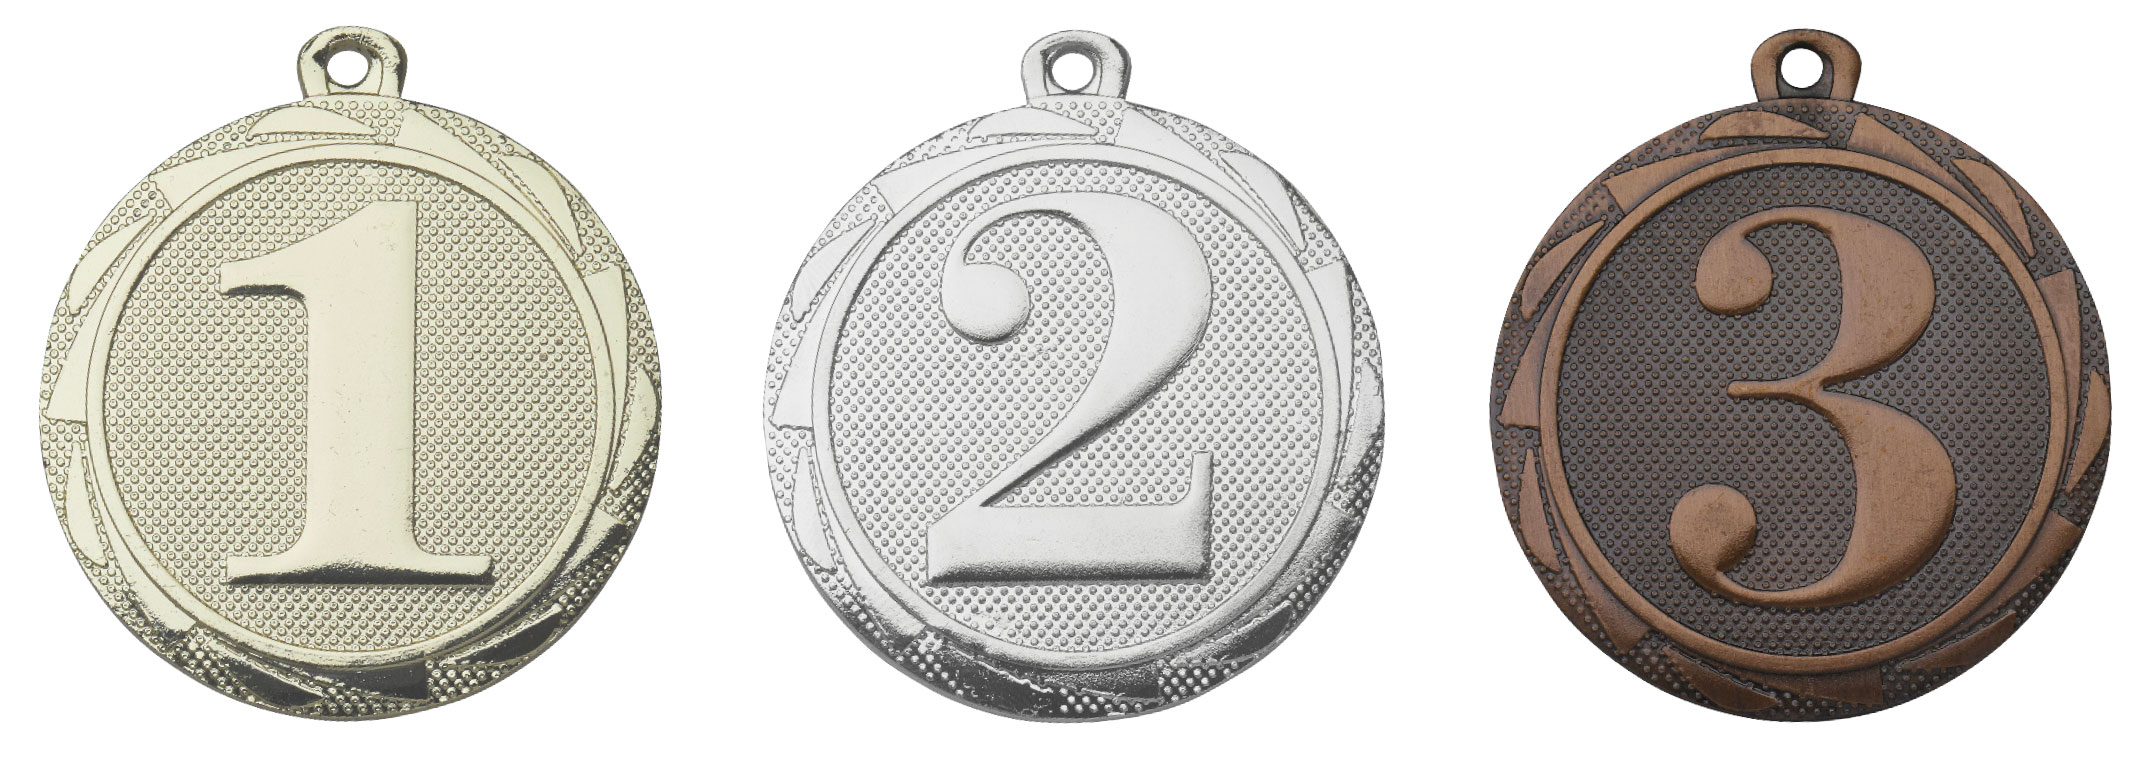 E3013   Medaille 2e plaats   3 - 5 cm medailles  Prijzenshop.nl